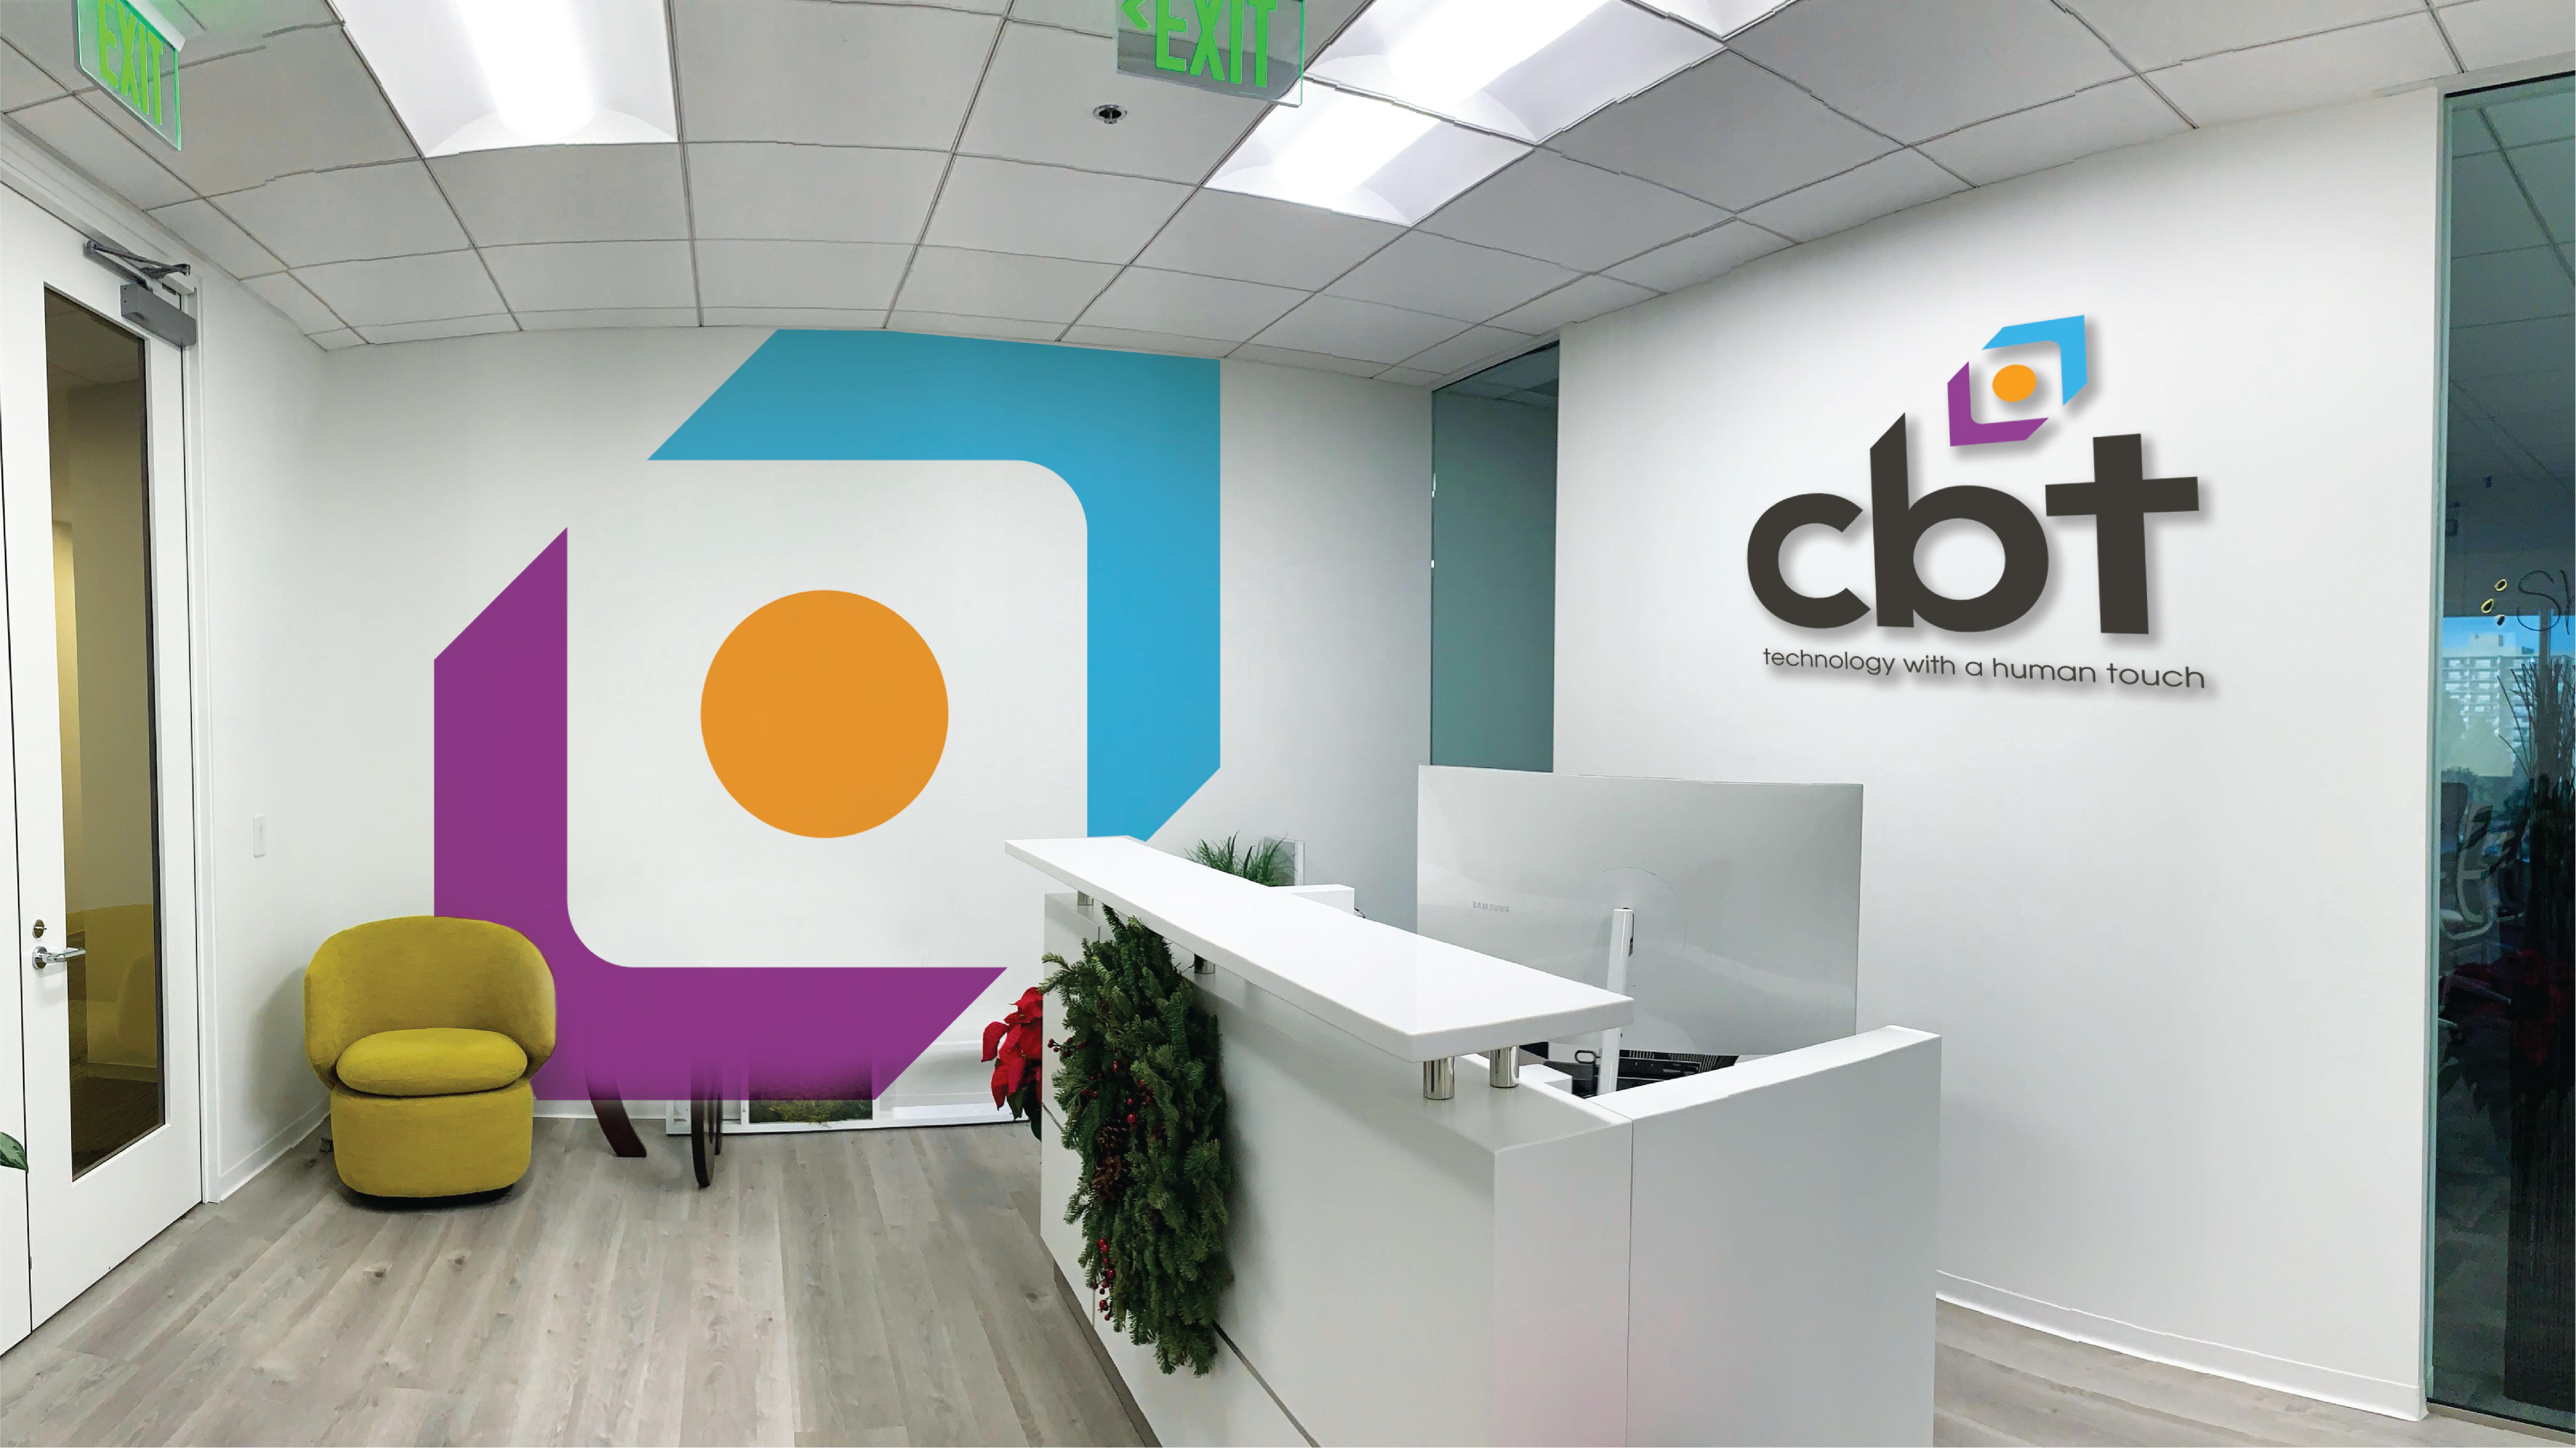 cbt logo branding on office wall